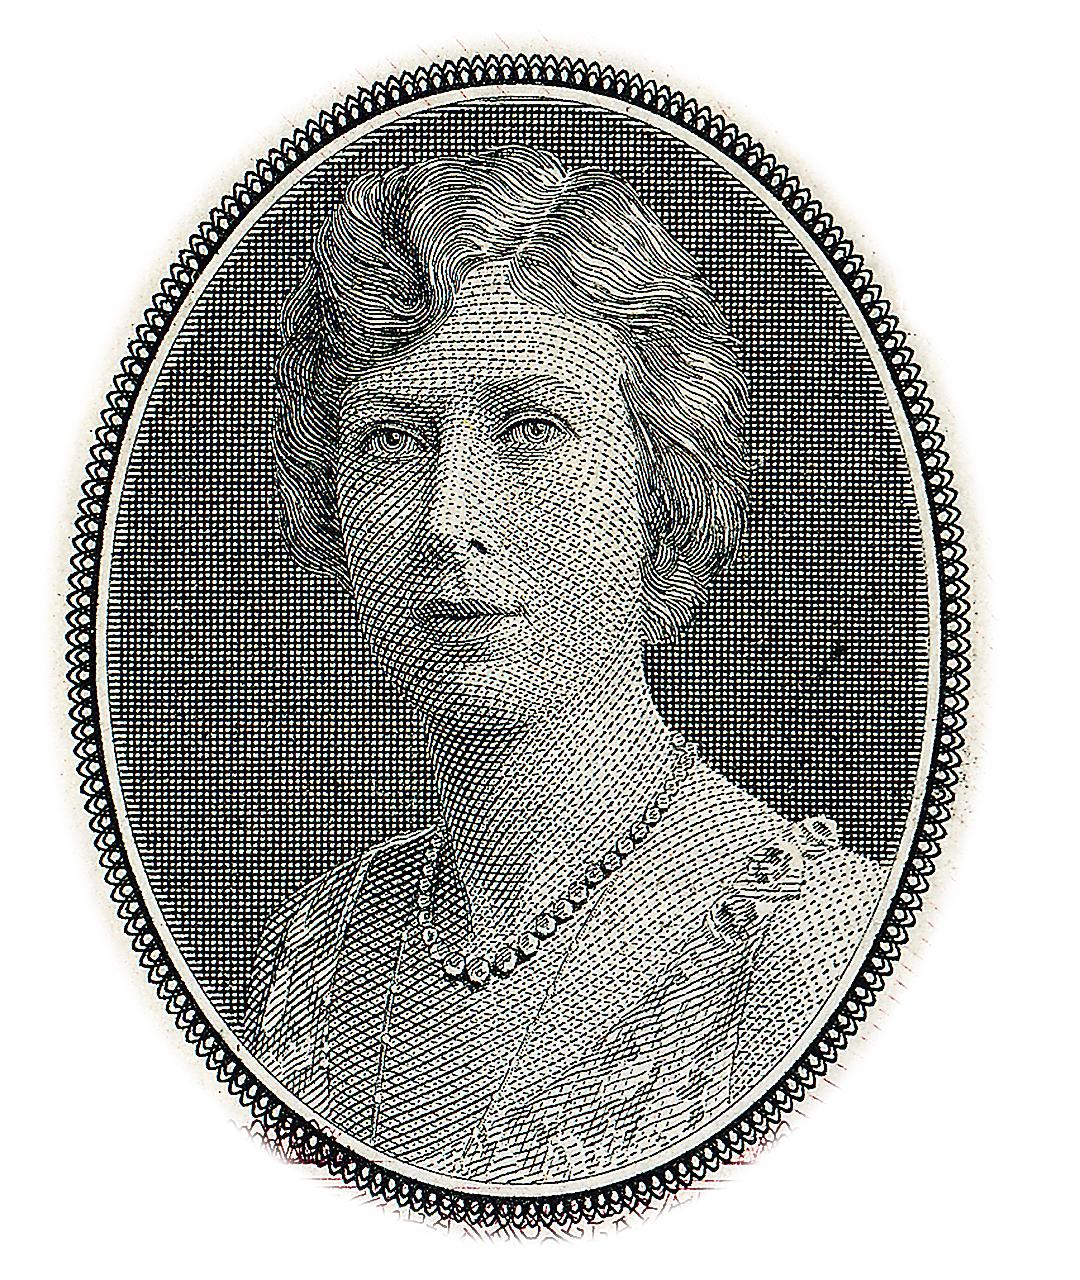 a bank note engraving of Princess Mary